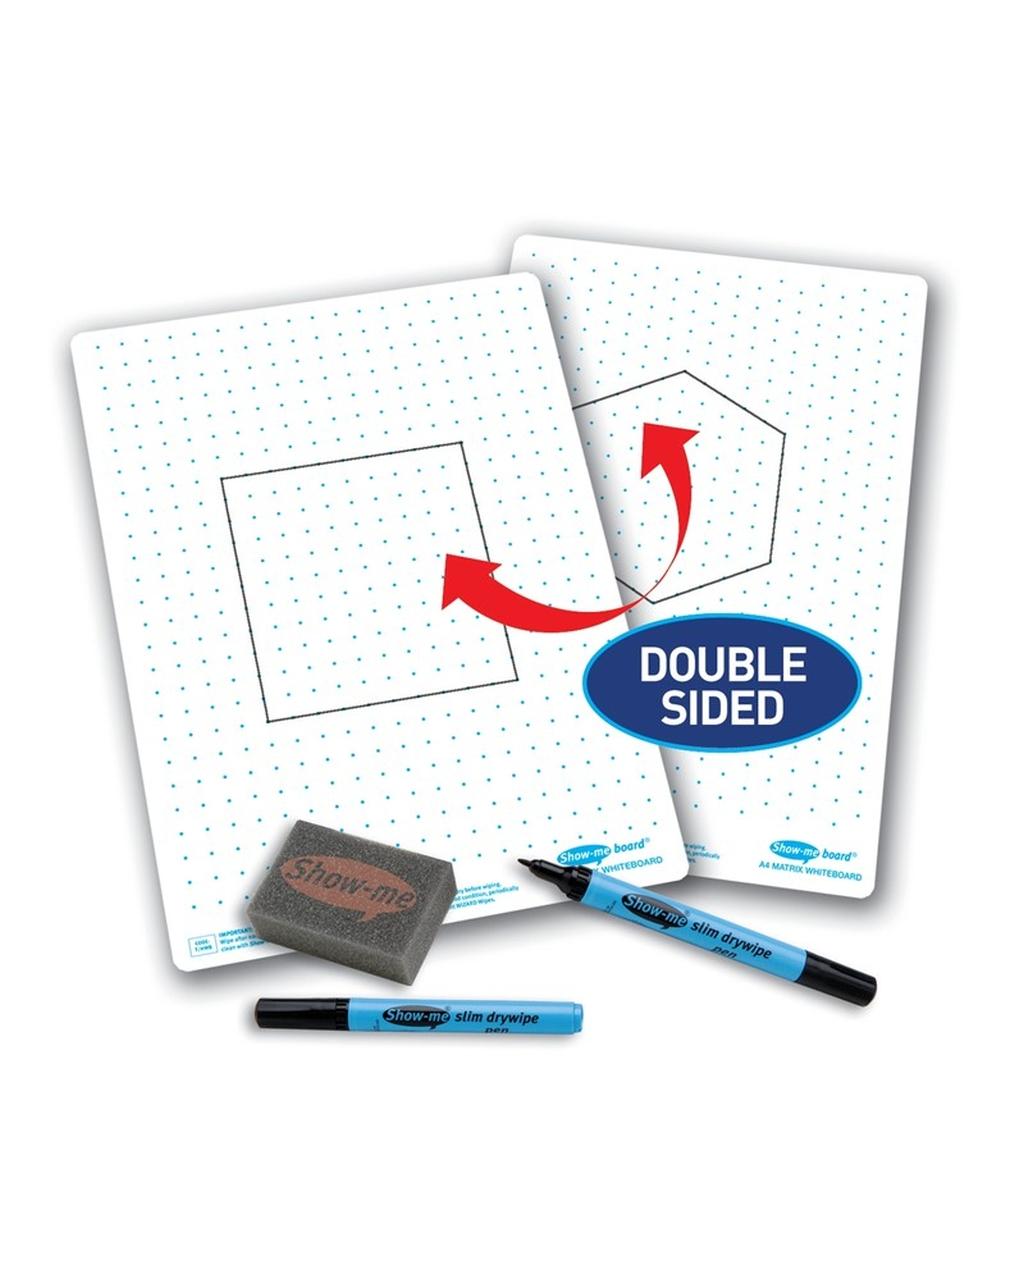 Show-me A4 Matrix Whiteboard Class Pack